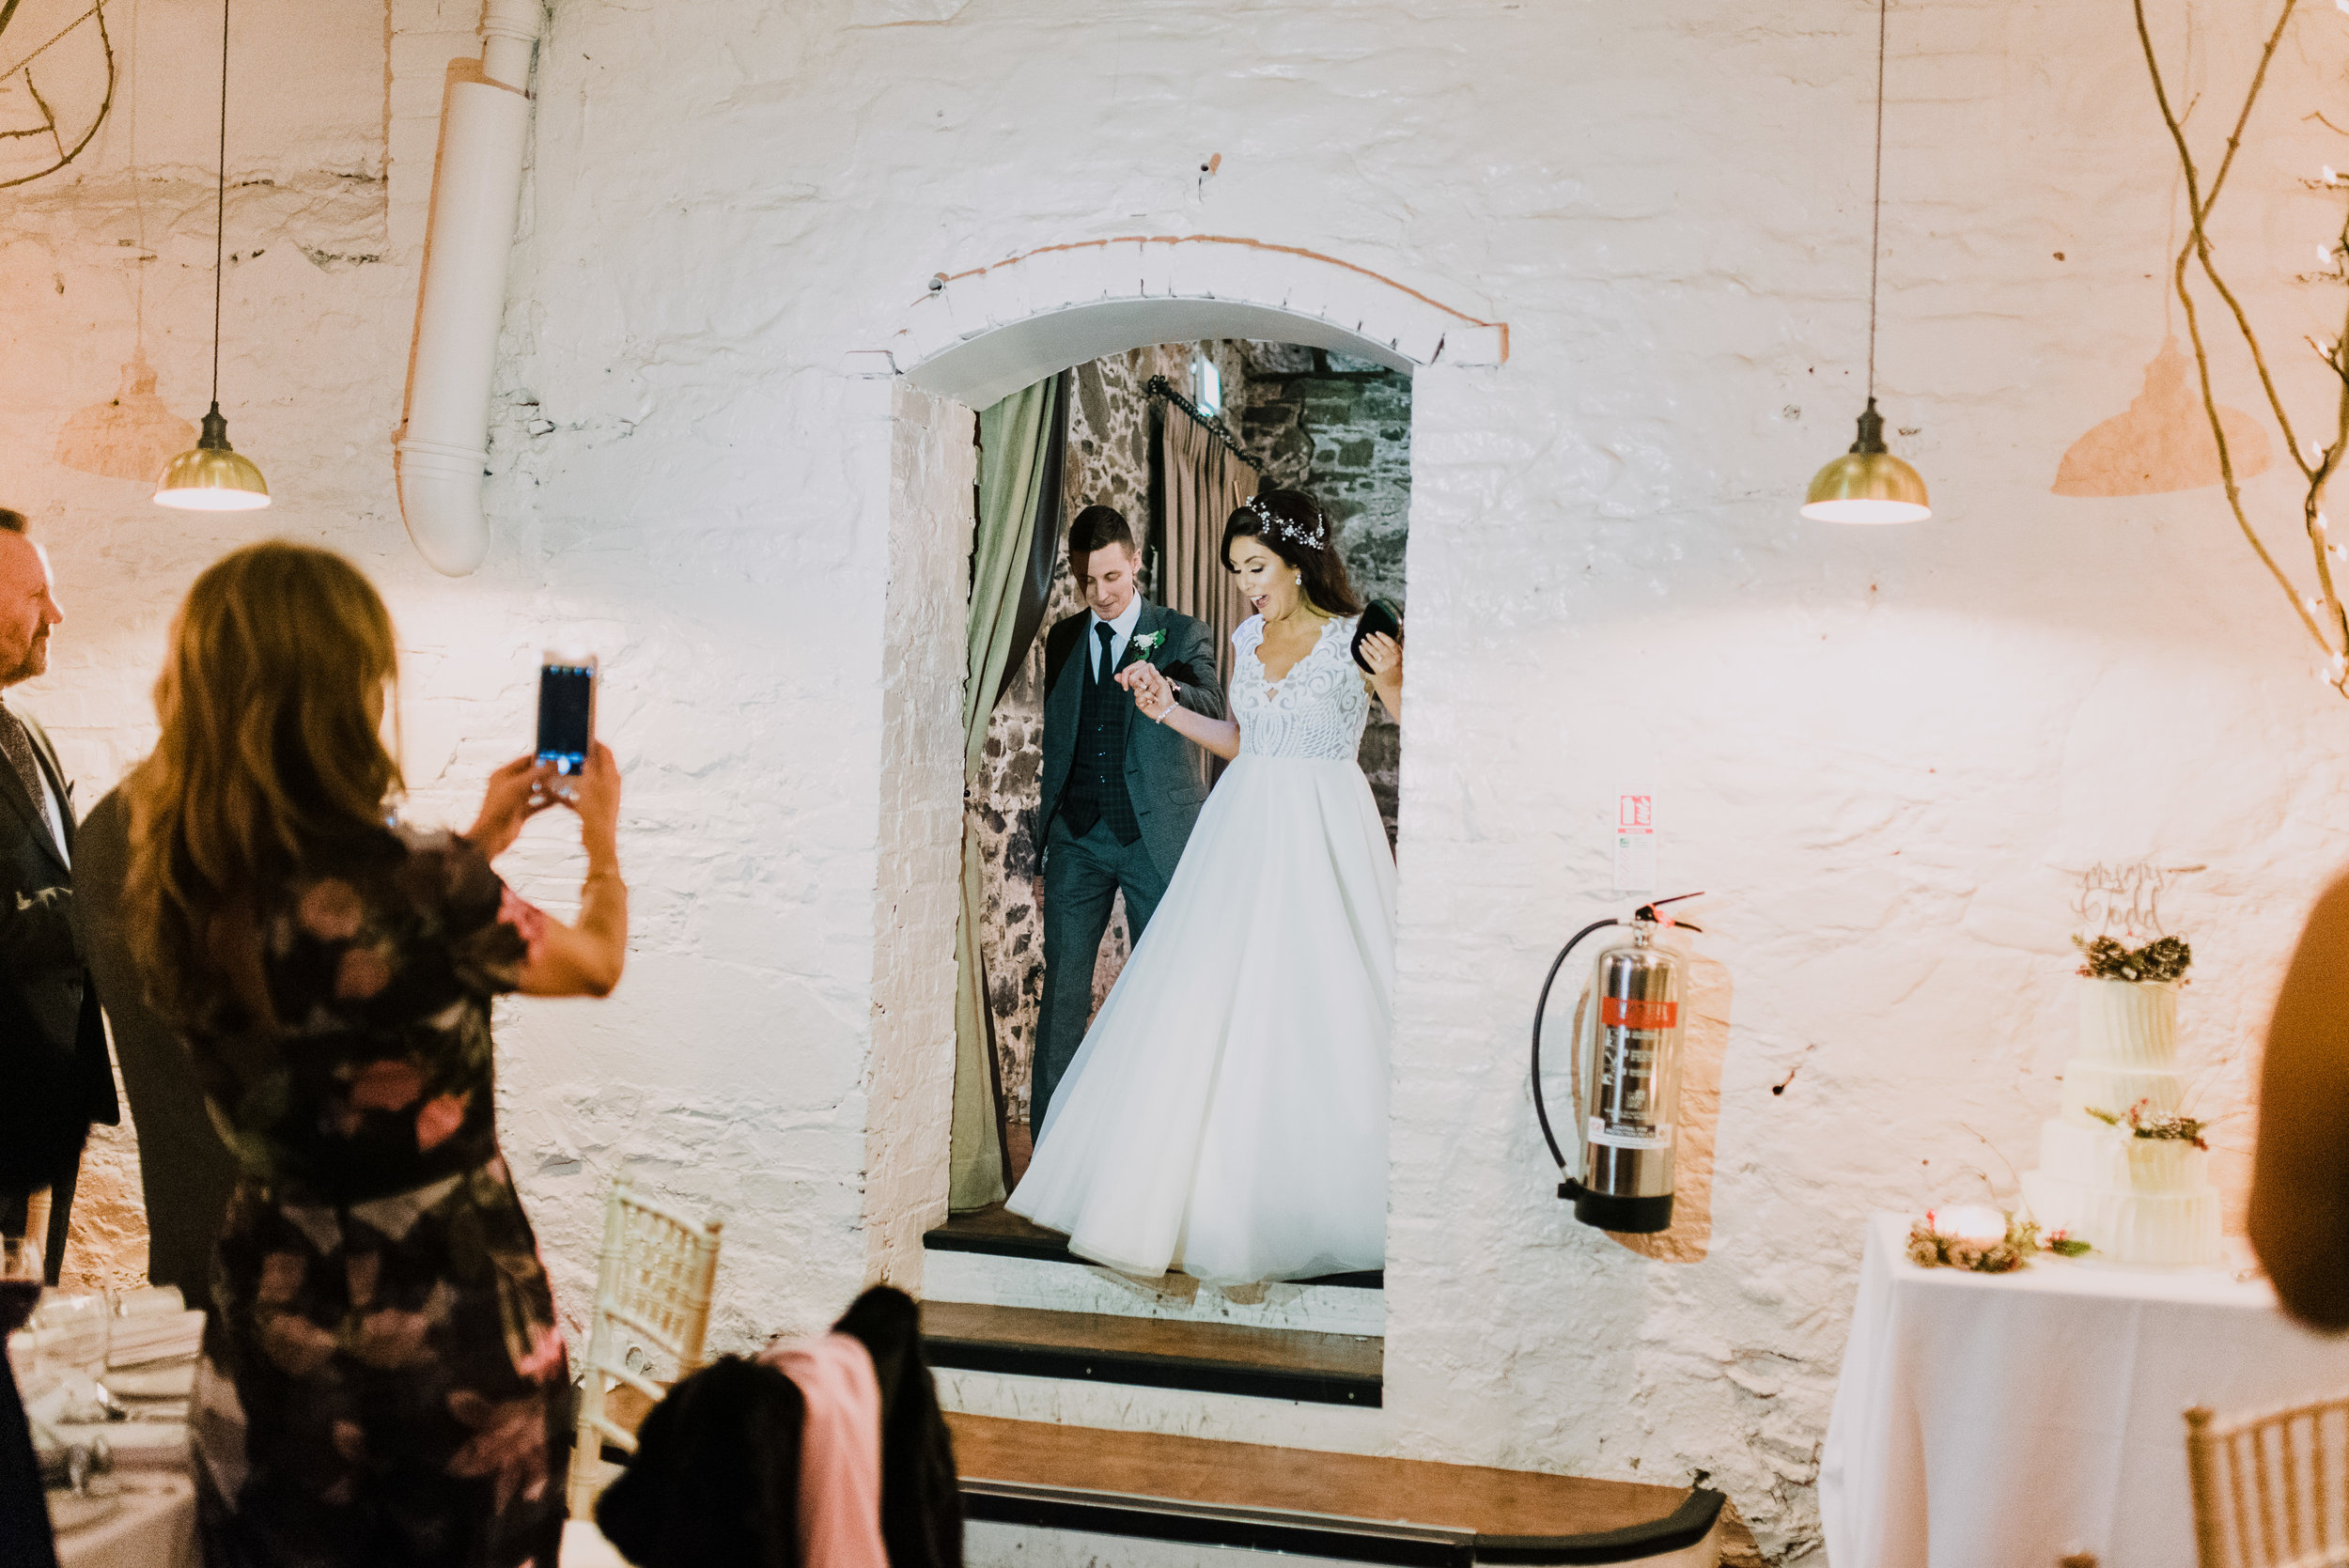 larchfield estate wedding, wedding venues northern ireland, barn wedding venues northern ireland, wedding photos larchfield estate, shane todd wedding, larchfield wedding decor ideas (12).jpg